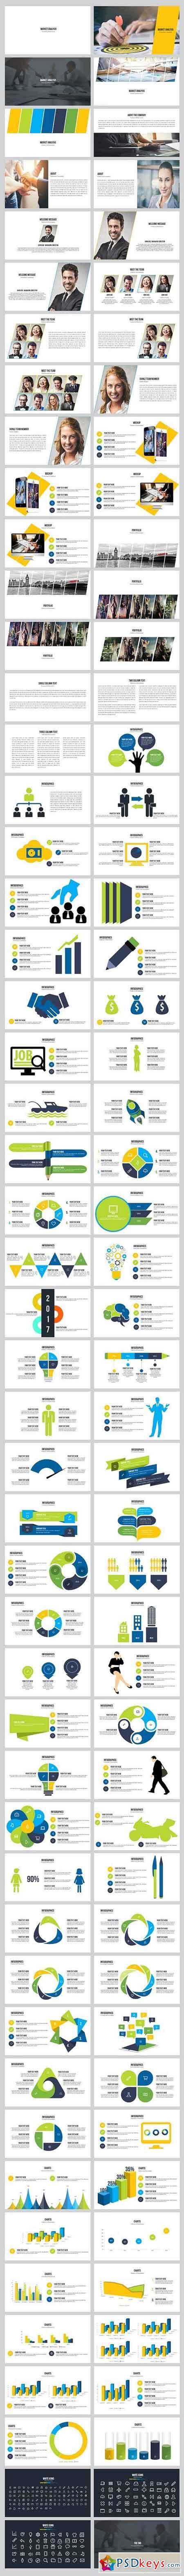 Dynamic Templates v205 The Next Generation  DIY Planner